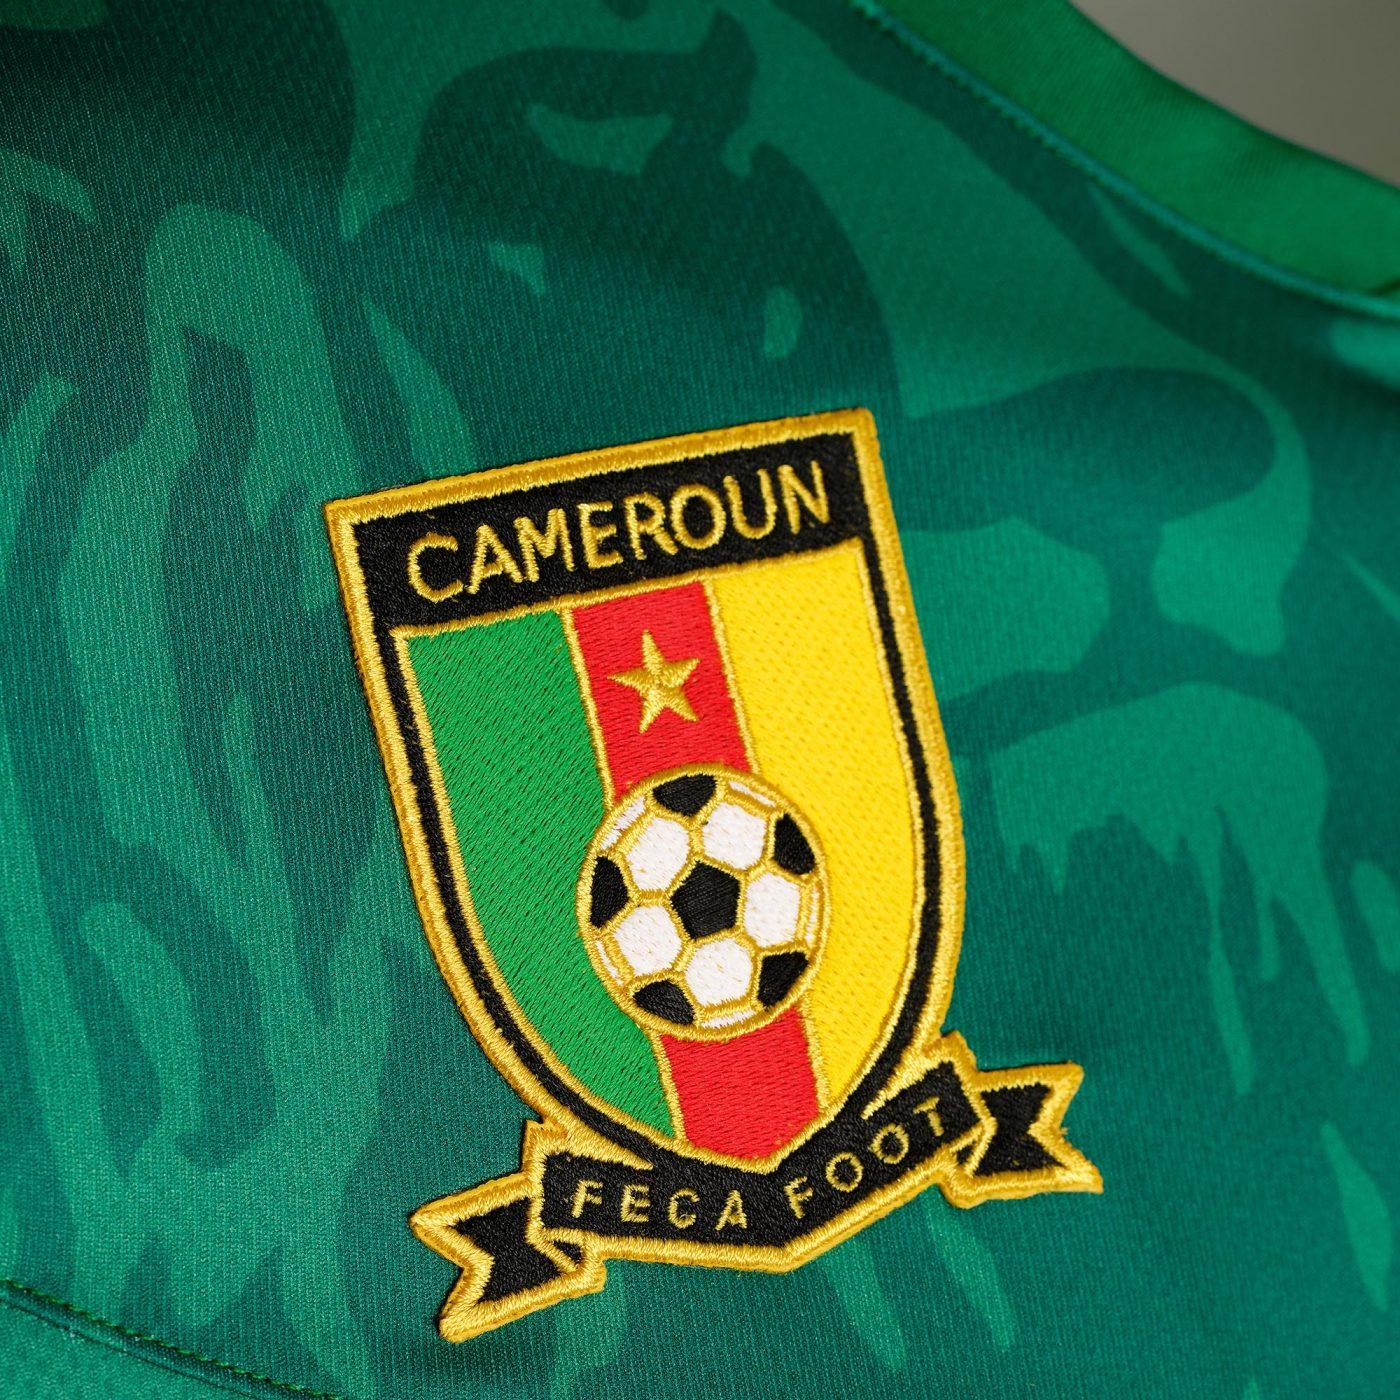 maillot-domicile-cameroun-can-2019-coupe-du-monde-feminine-2019-le-coq-sportif-5